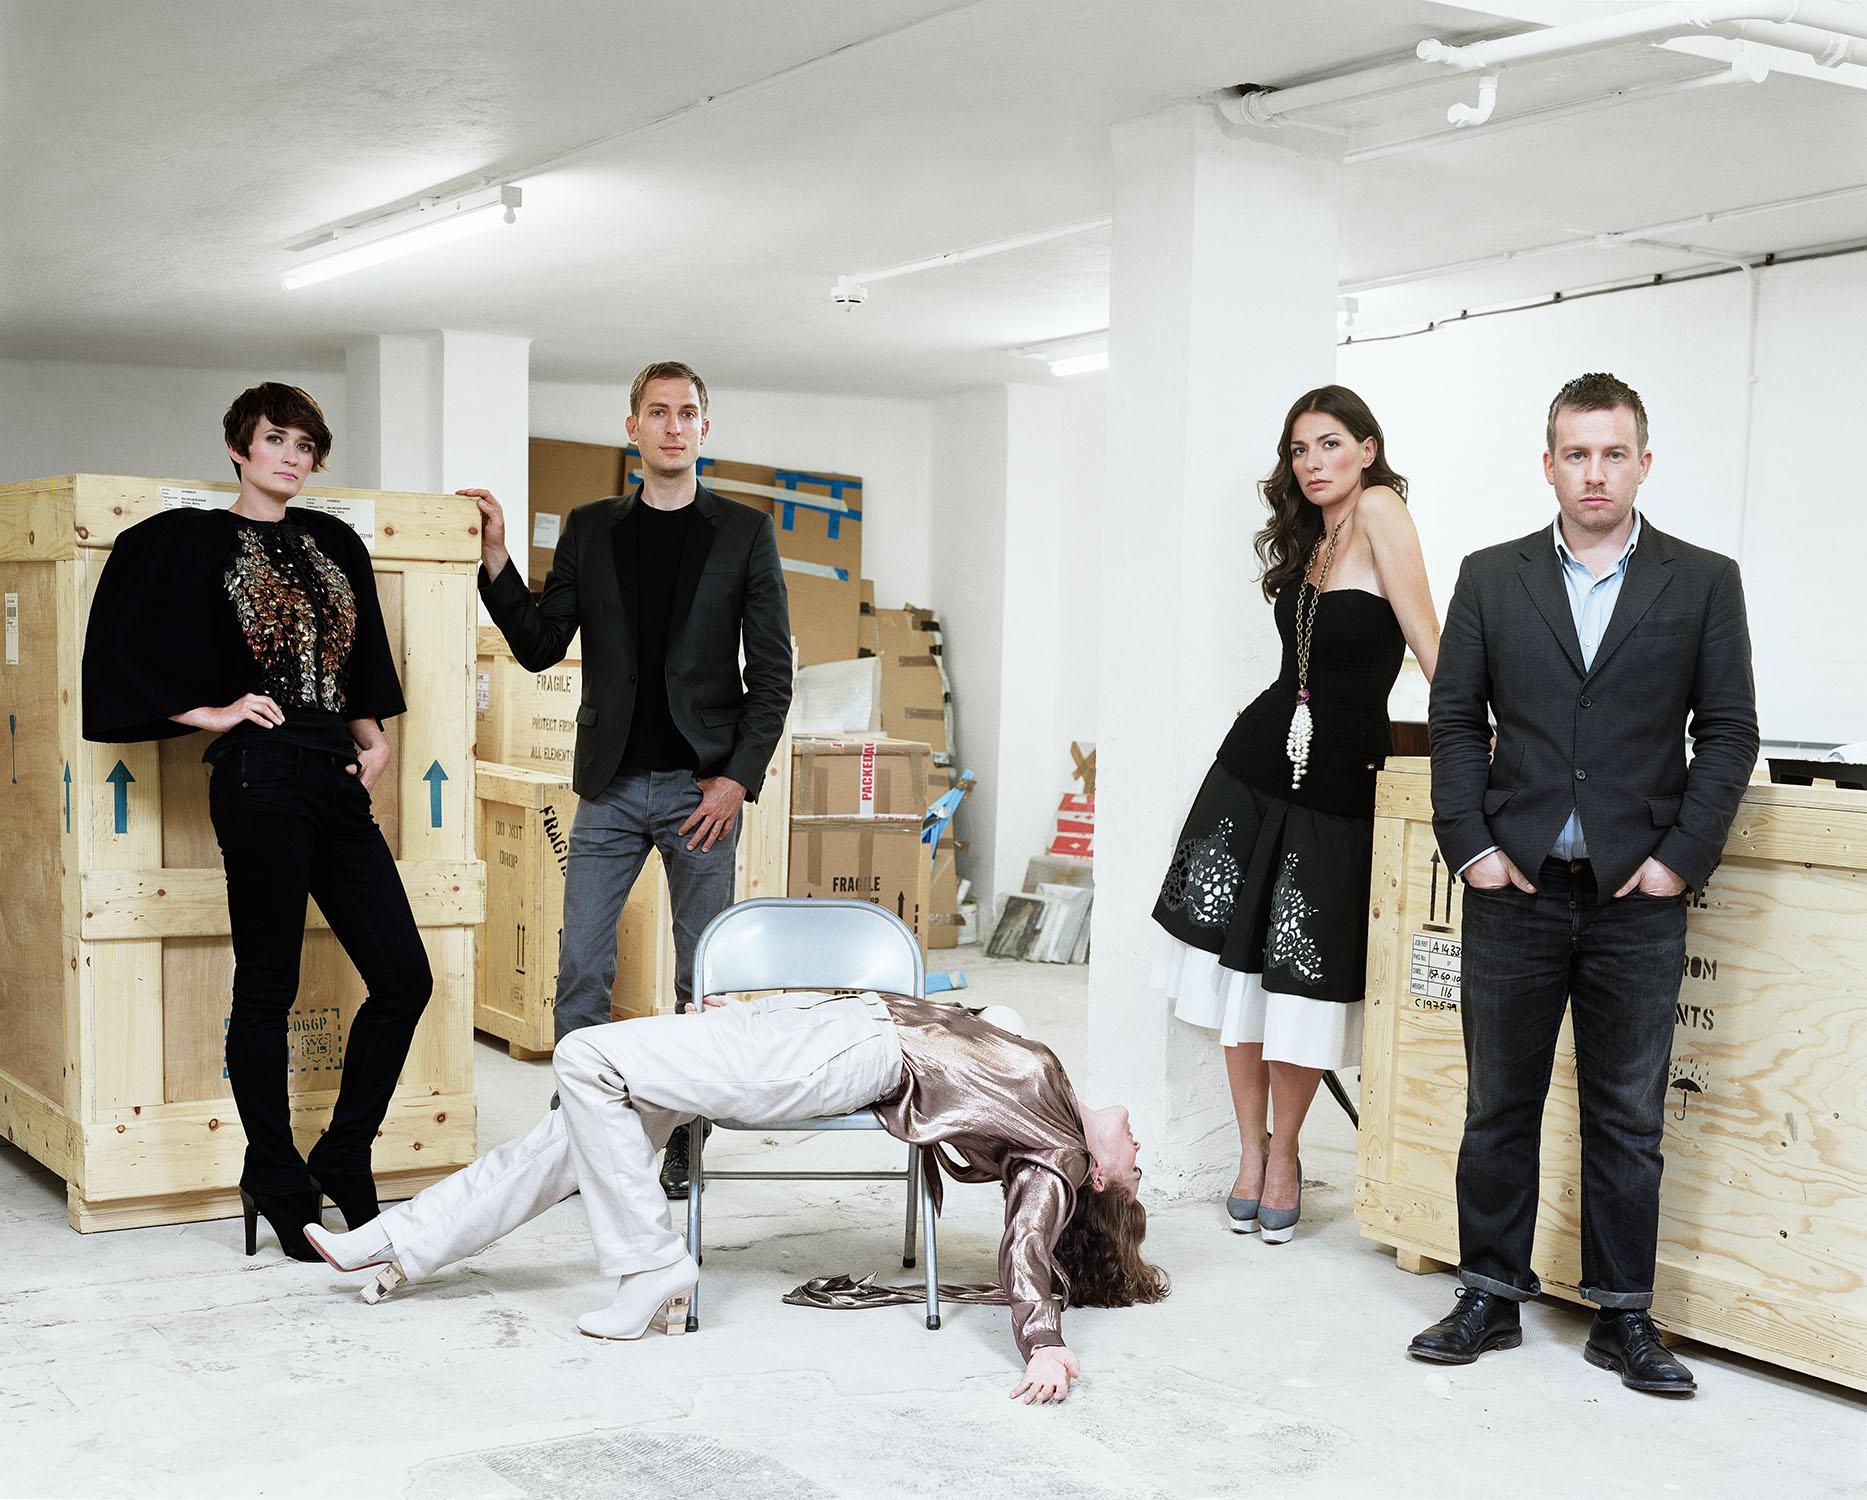 Vogue UK - London Gangs